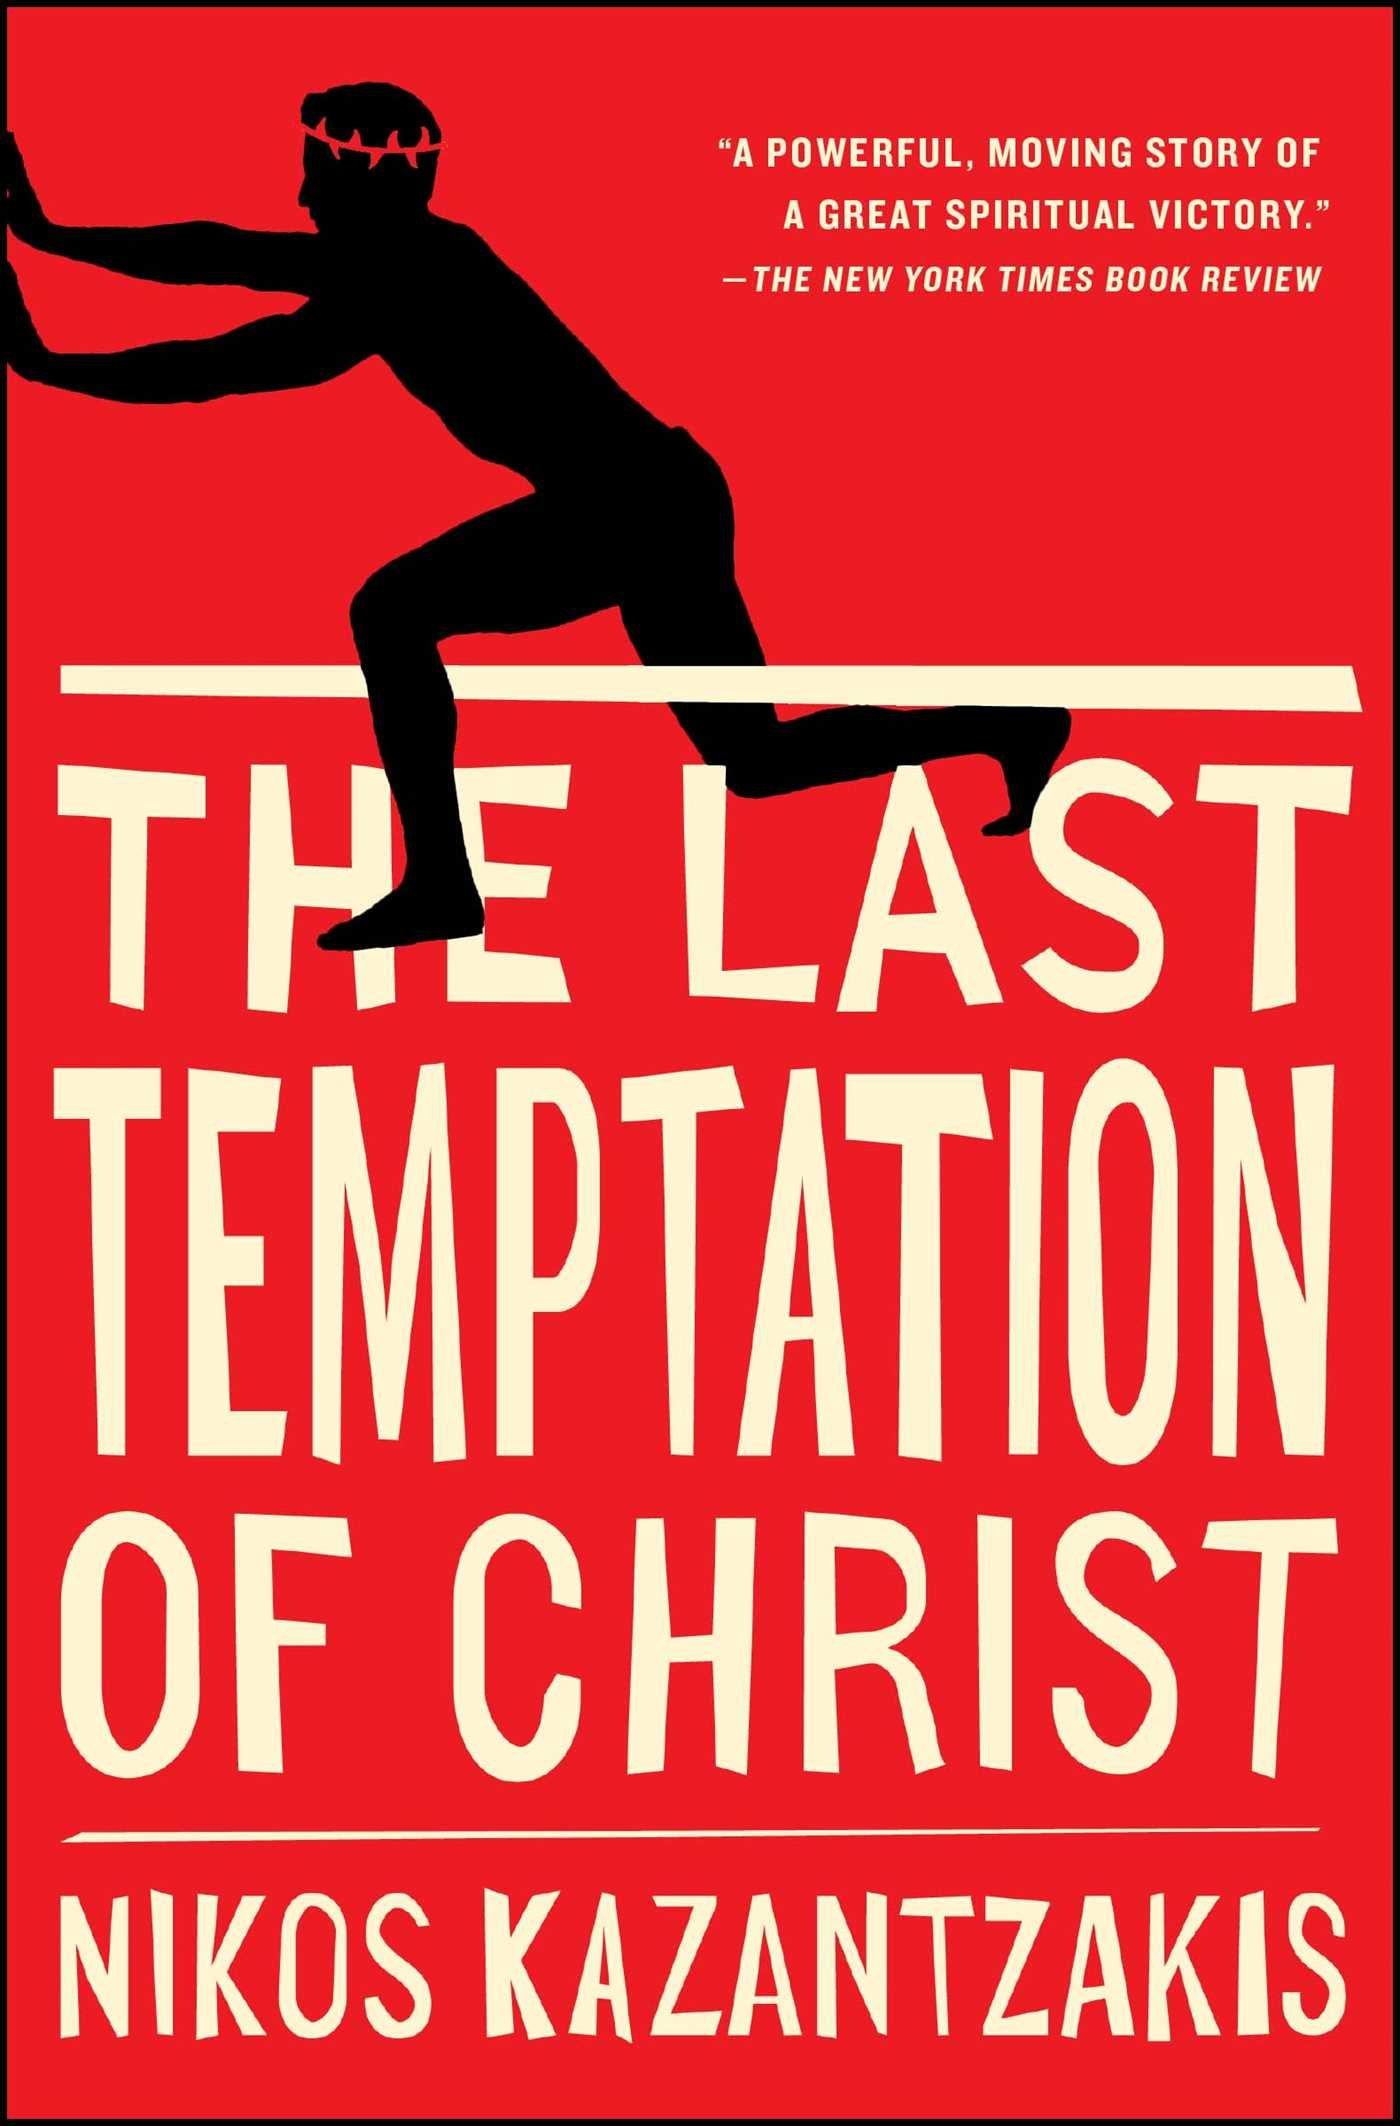 The Last Temptation Of Christ Nikos Kazantzakis P A Bien 9780684852560 Amazon Books